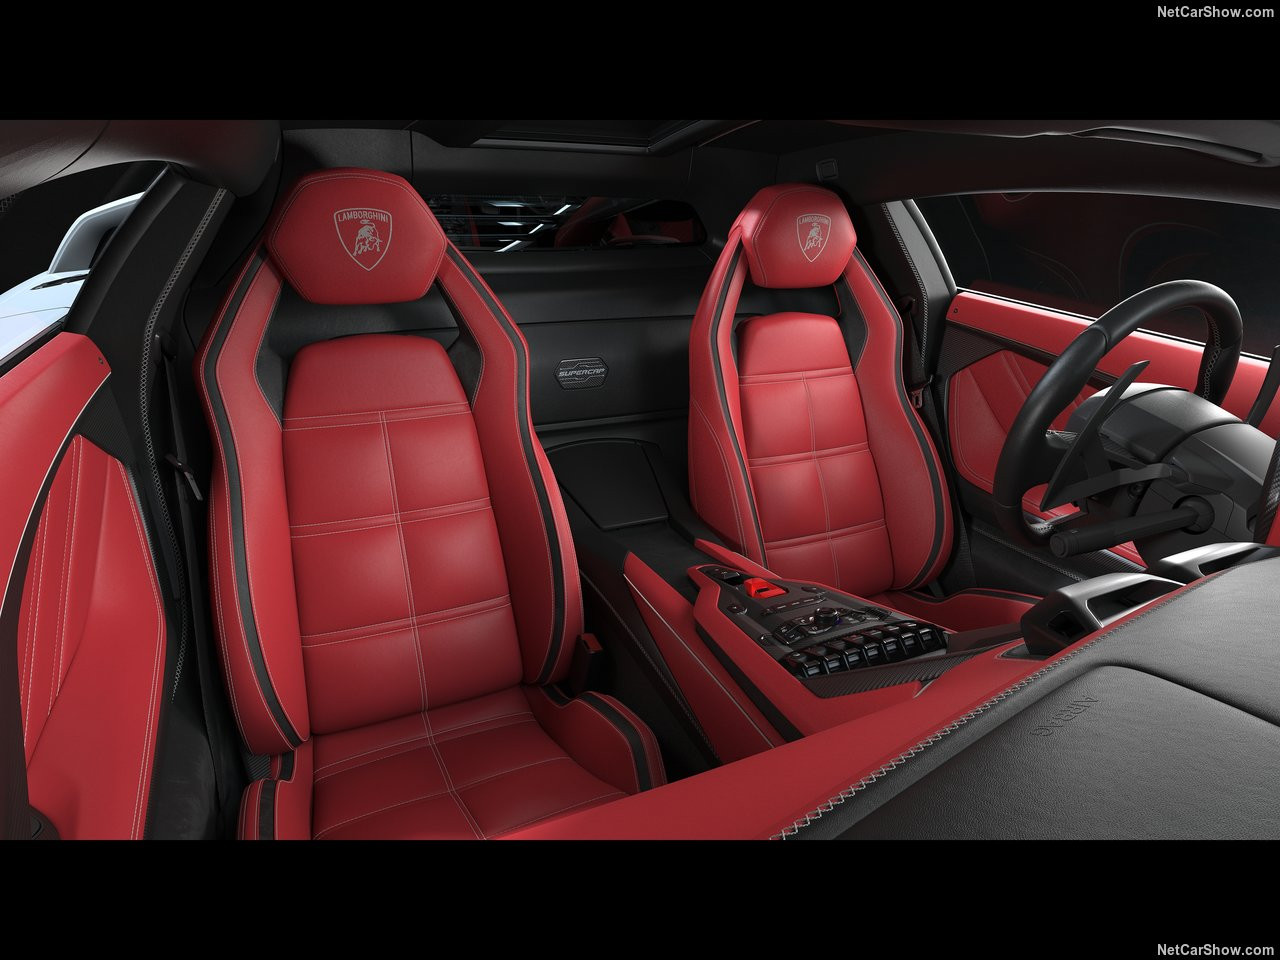 Lamborghini-Countach_LPI_800-4-2022-1280-37.jpg